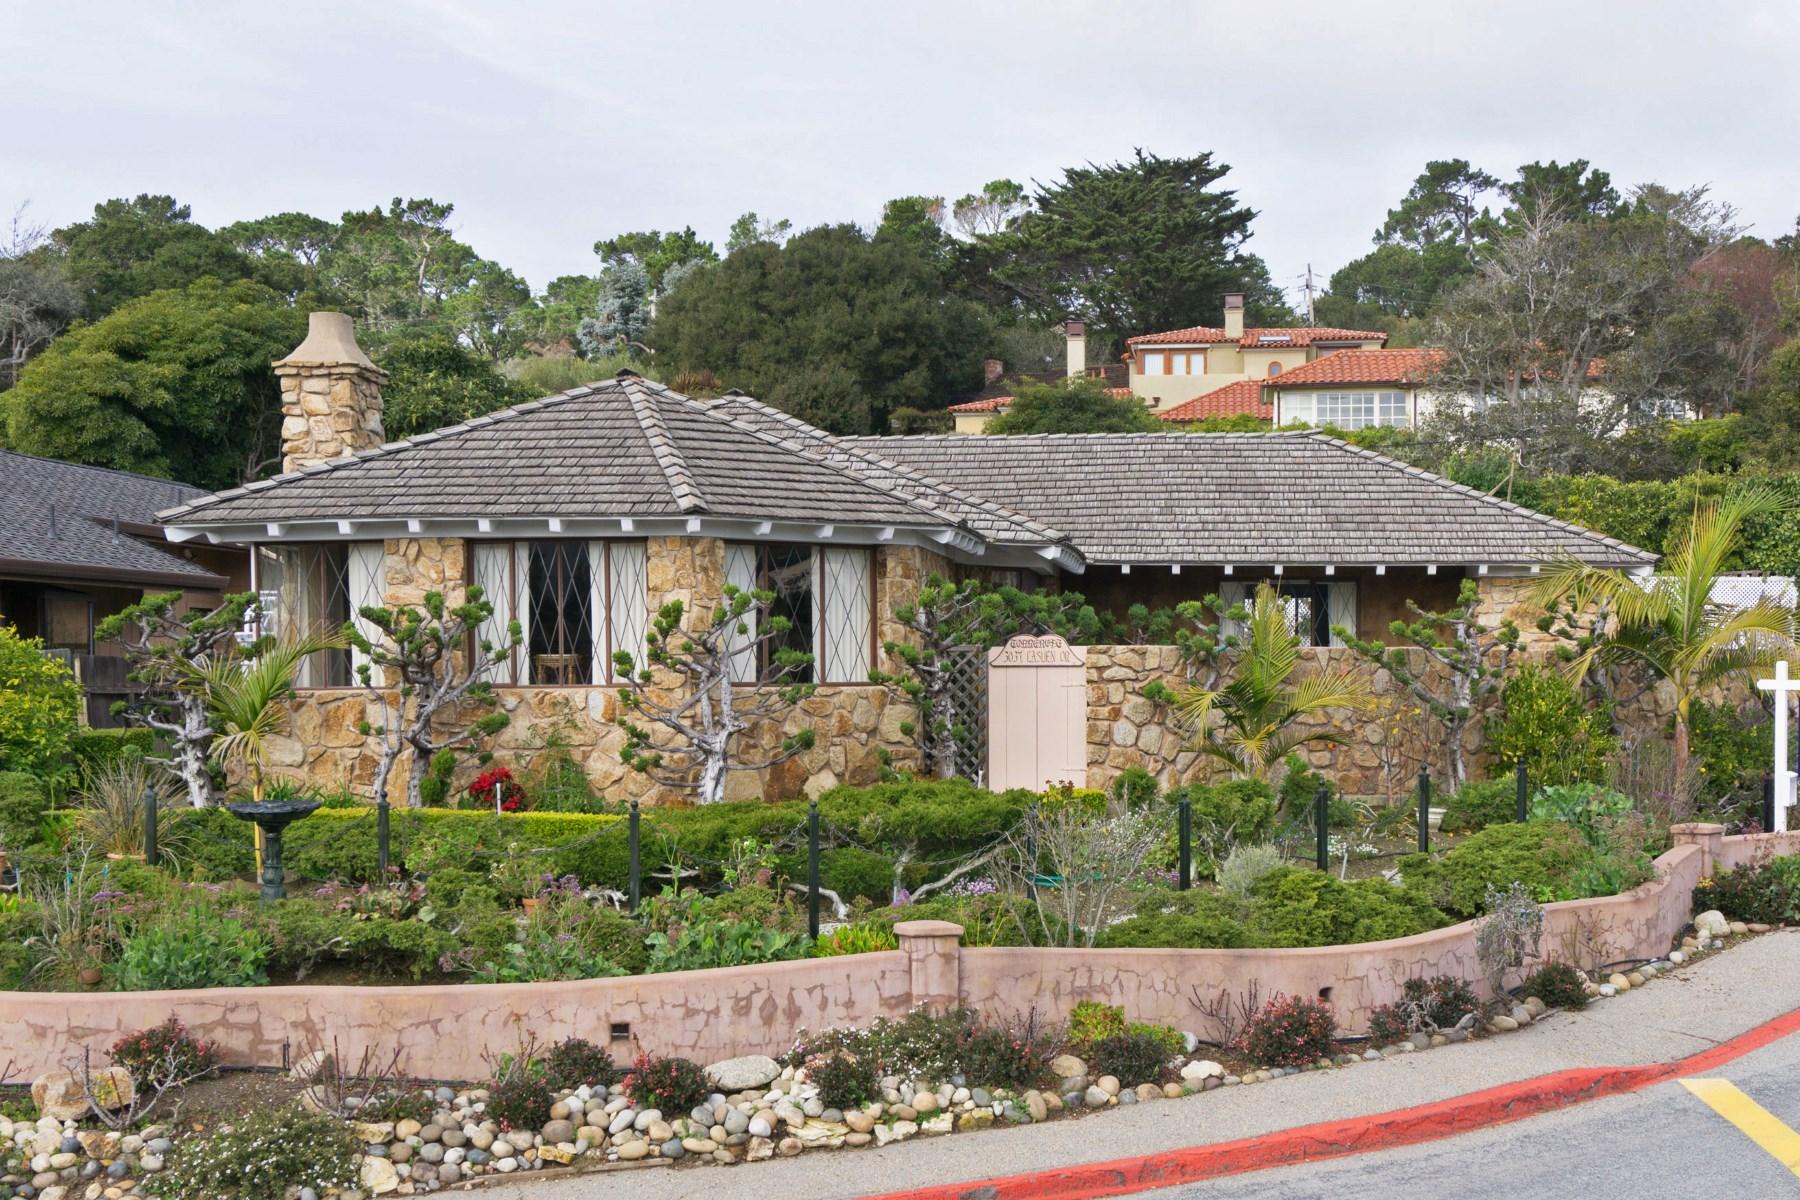 Moradia para Venda às Prominent Home by the Carmel Mission 3037 Lasuen Drive Carmel, Califórnia 93923 Estados Unidos